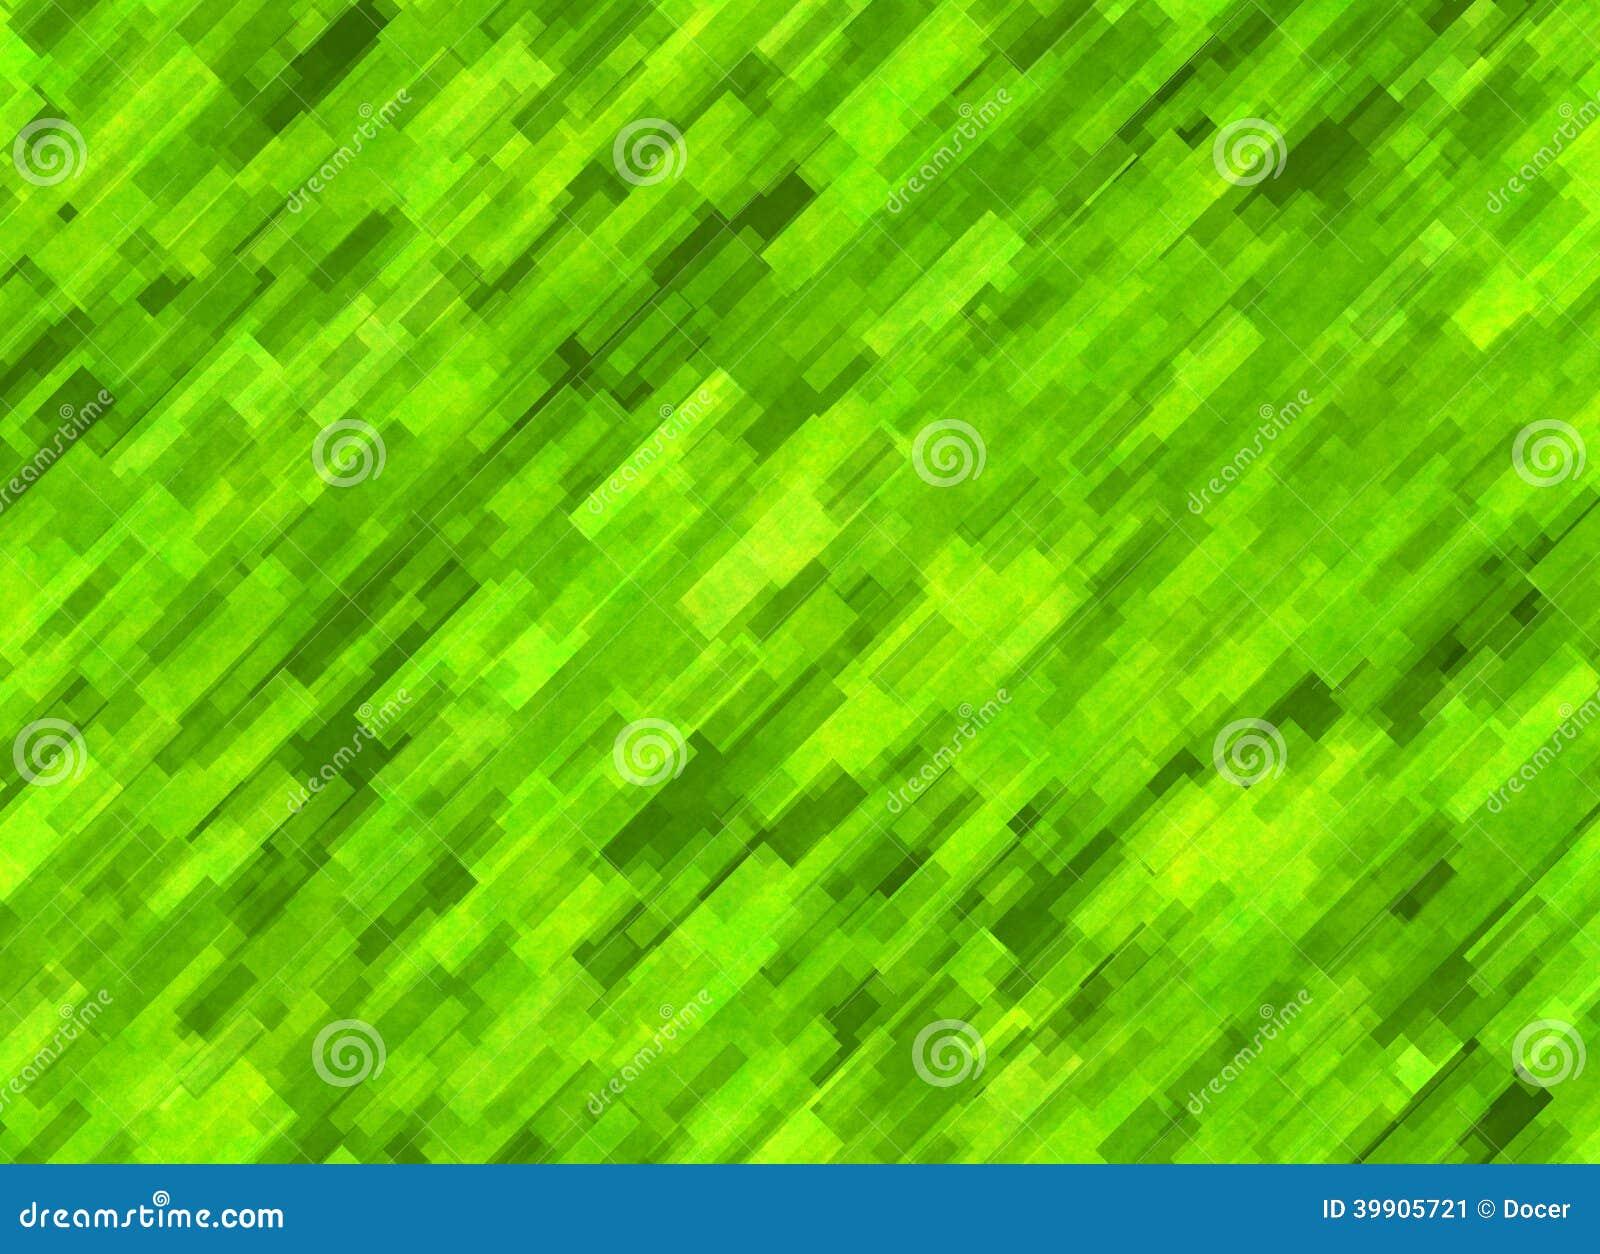 abstract grass wallpaper - photo #15